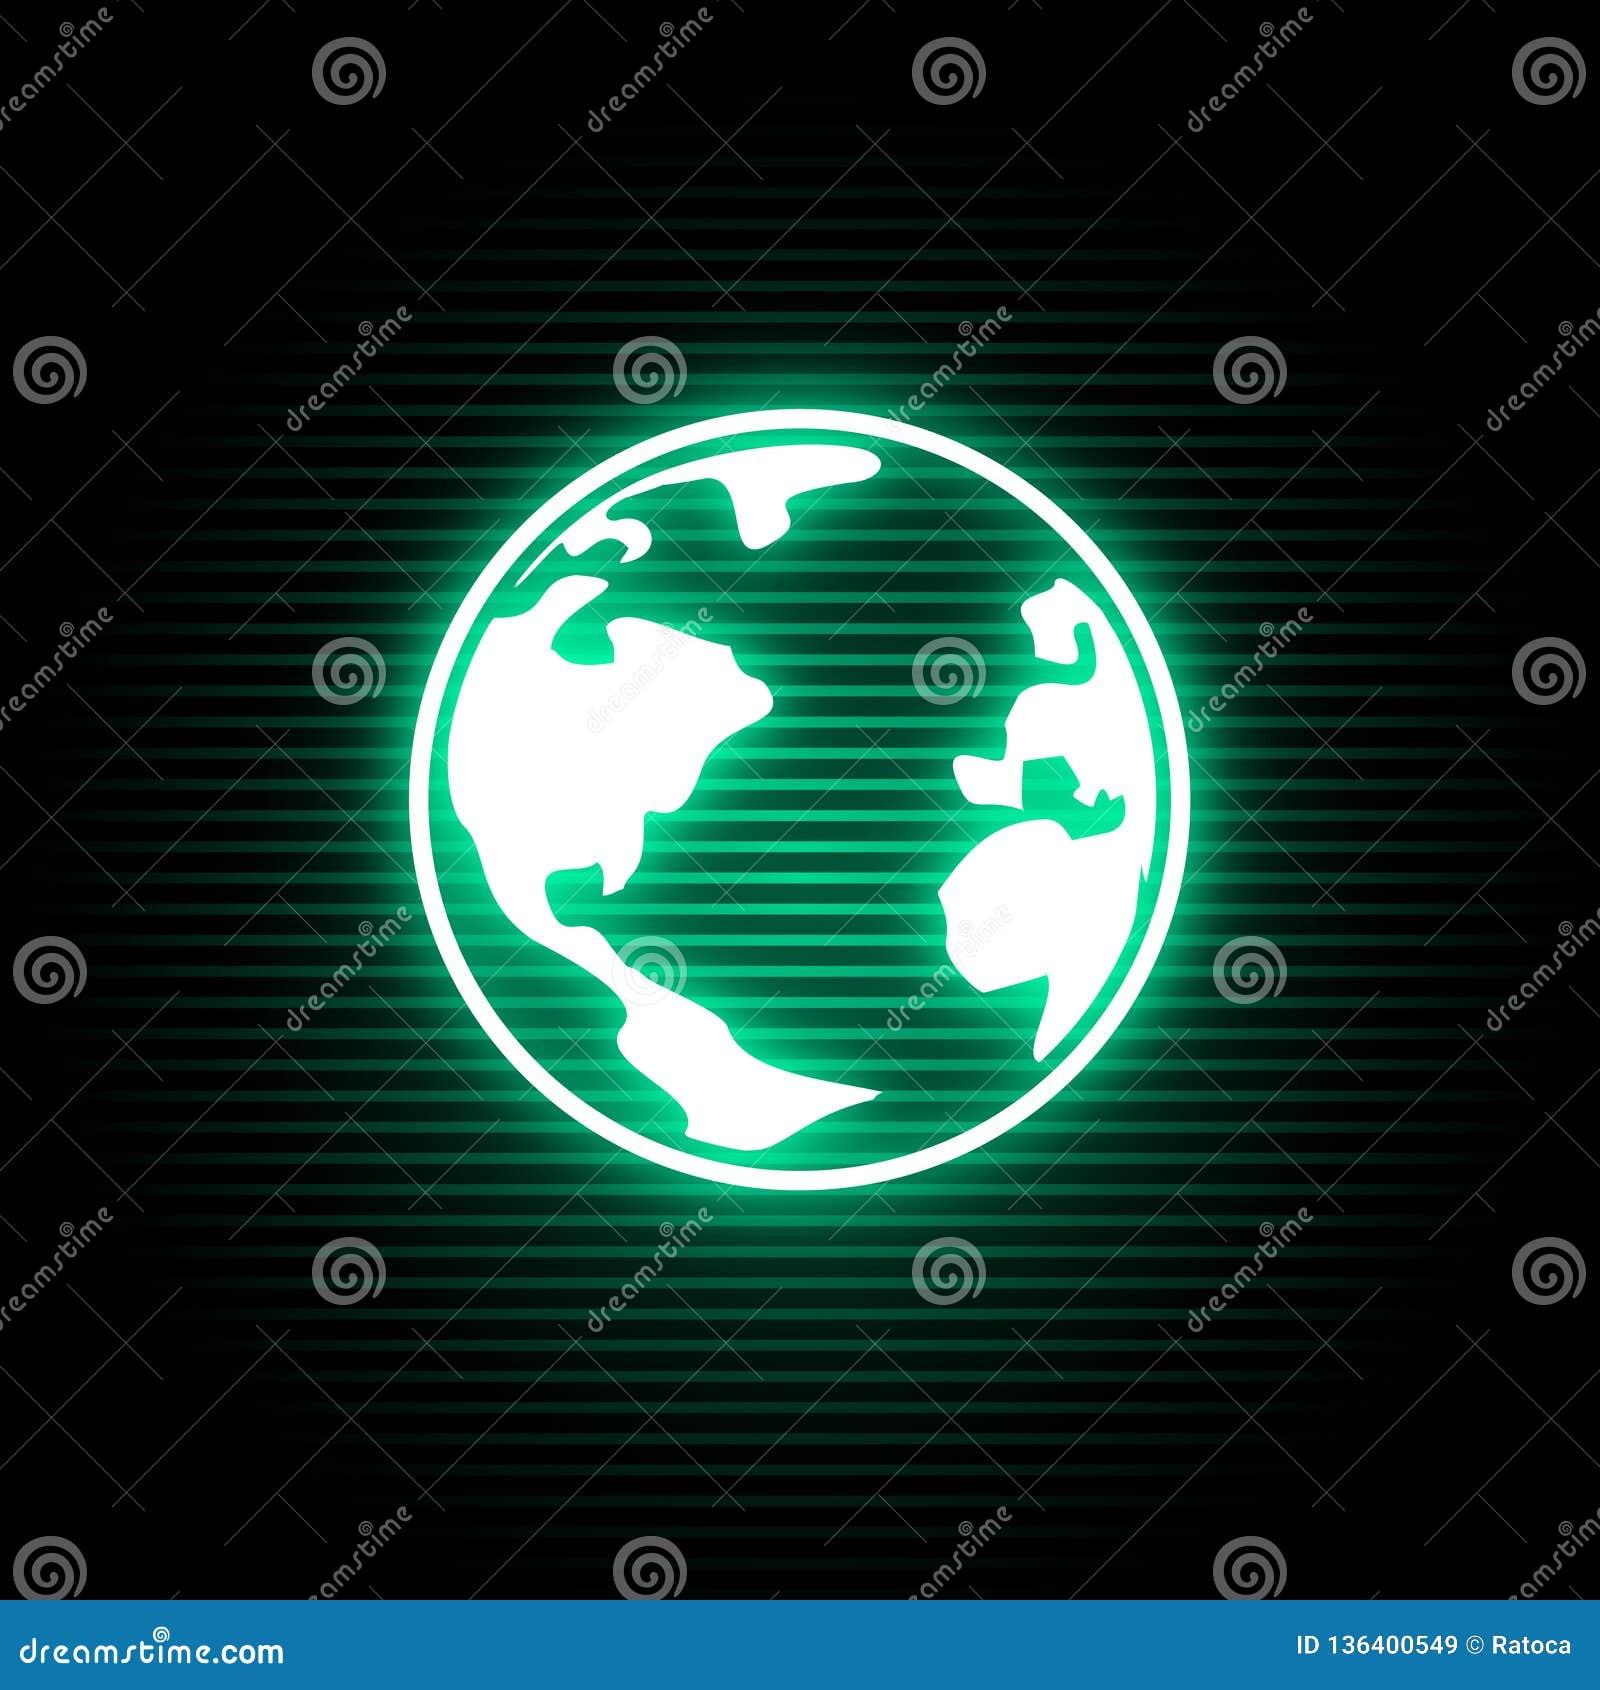 Neon Symbol